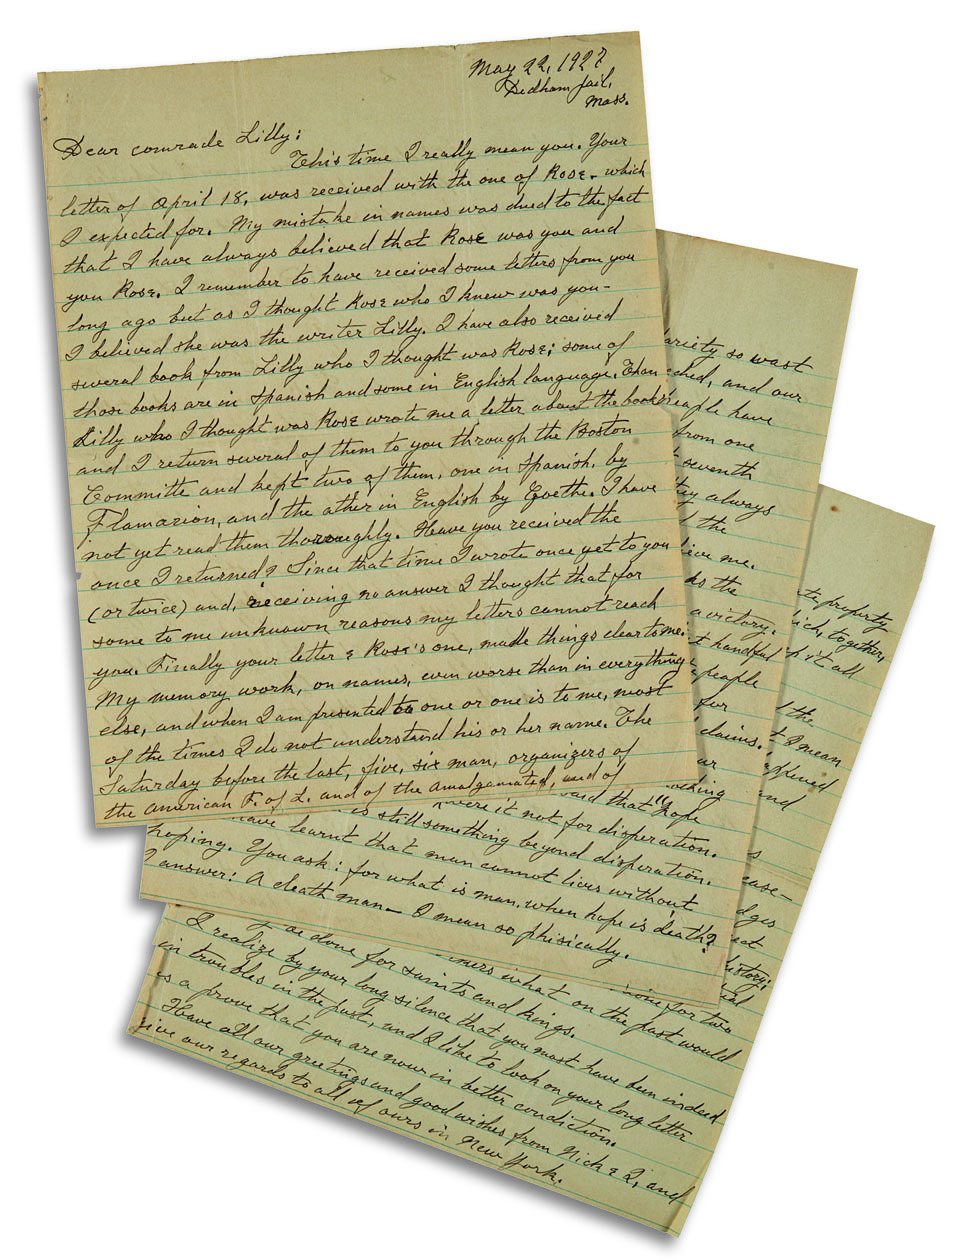 Da Leopardi a Pertini, lettere e scritti all'asta da Bolaffi